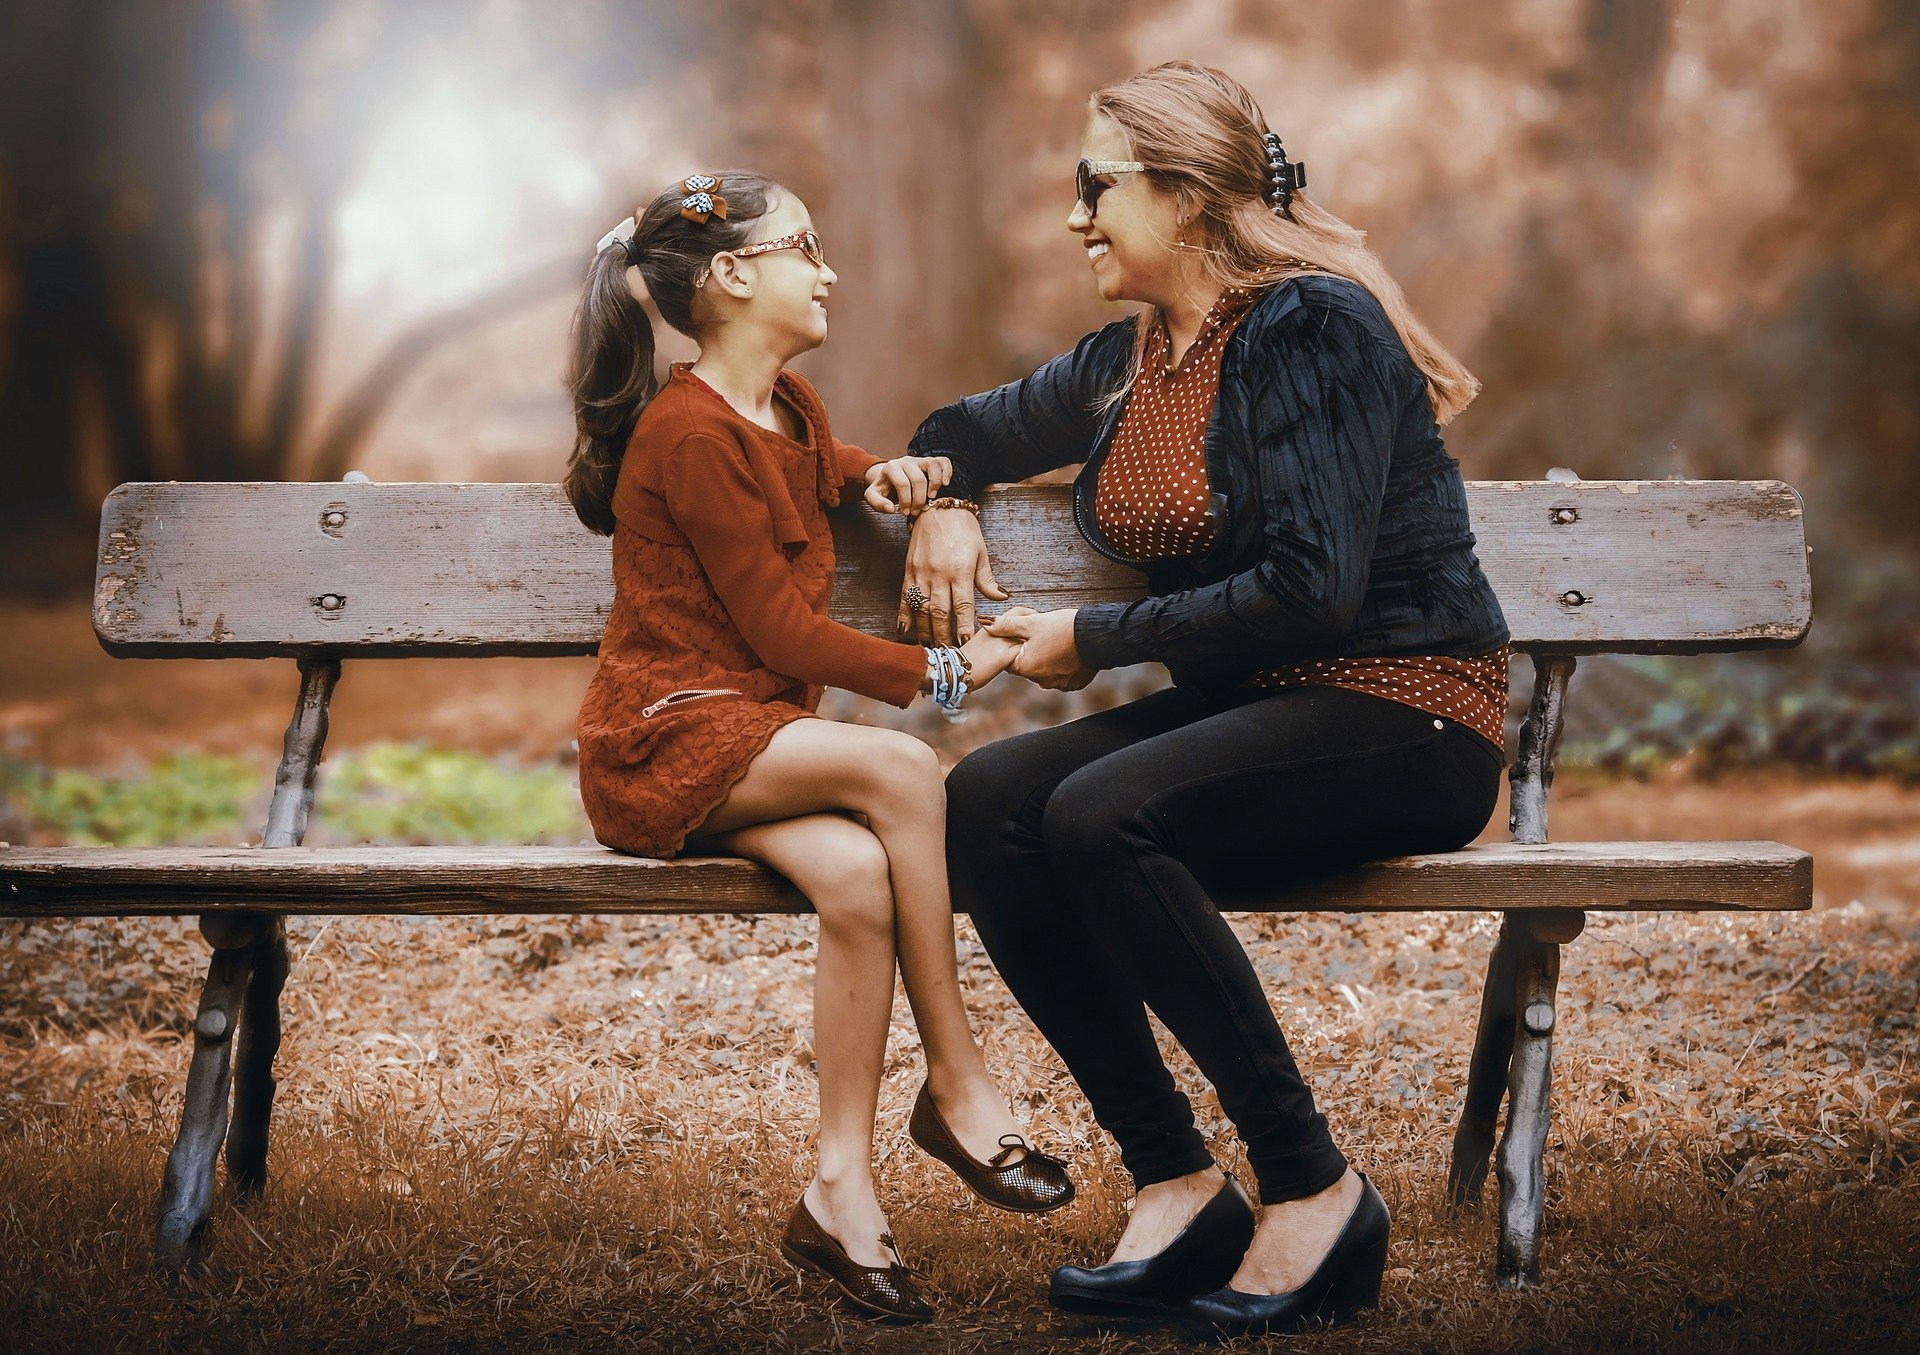 reagrupación familiar para extranjeros